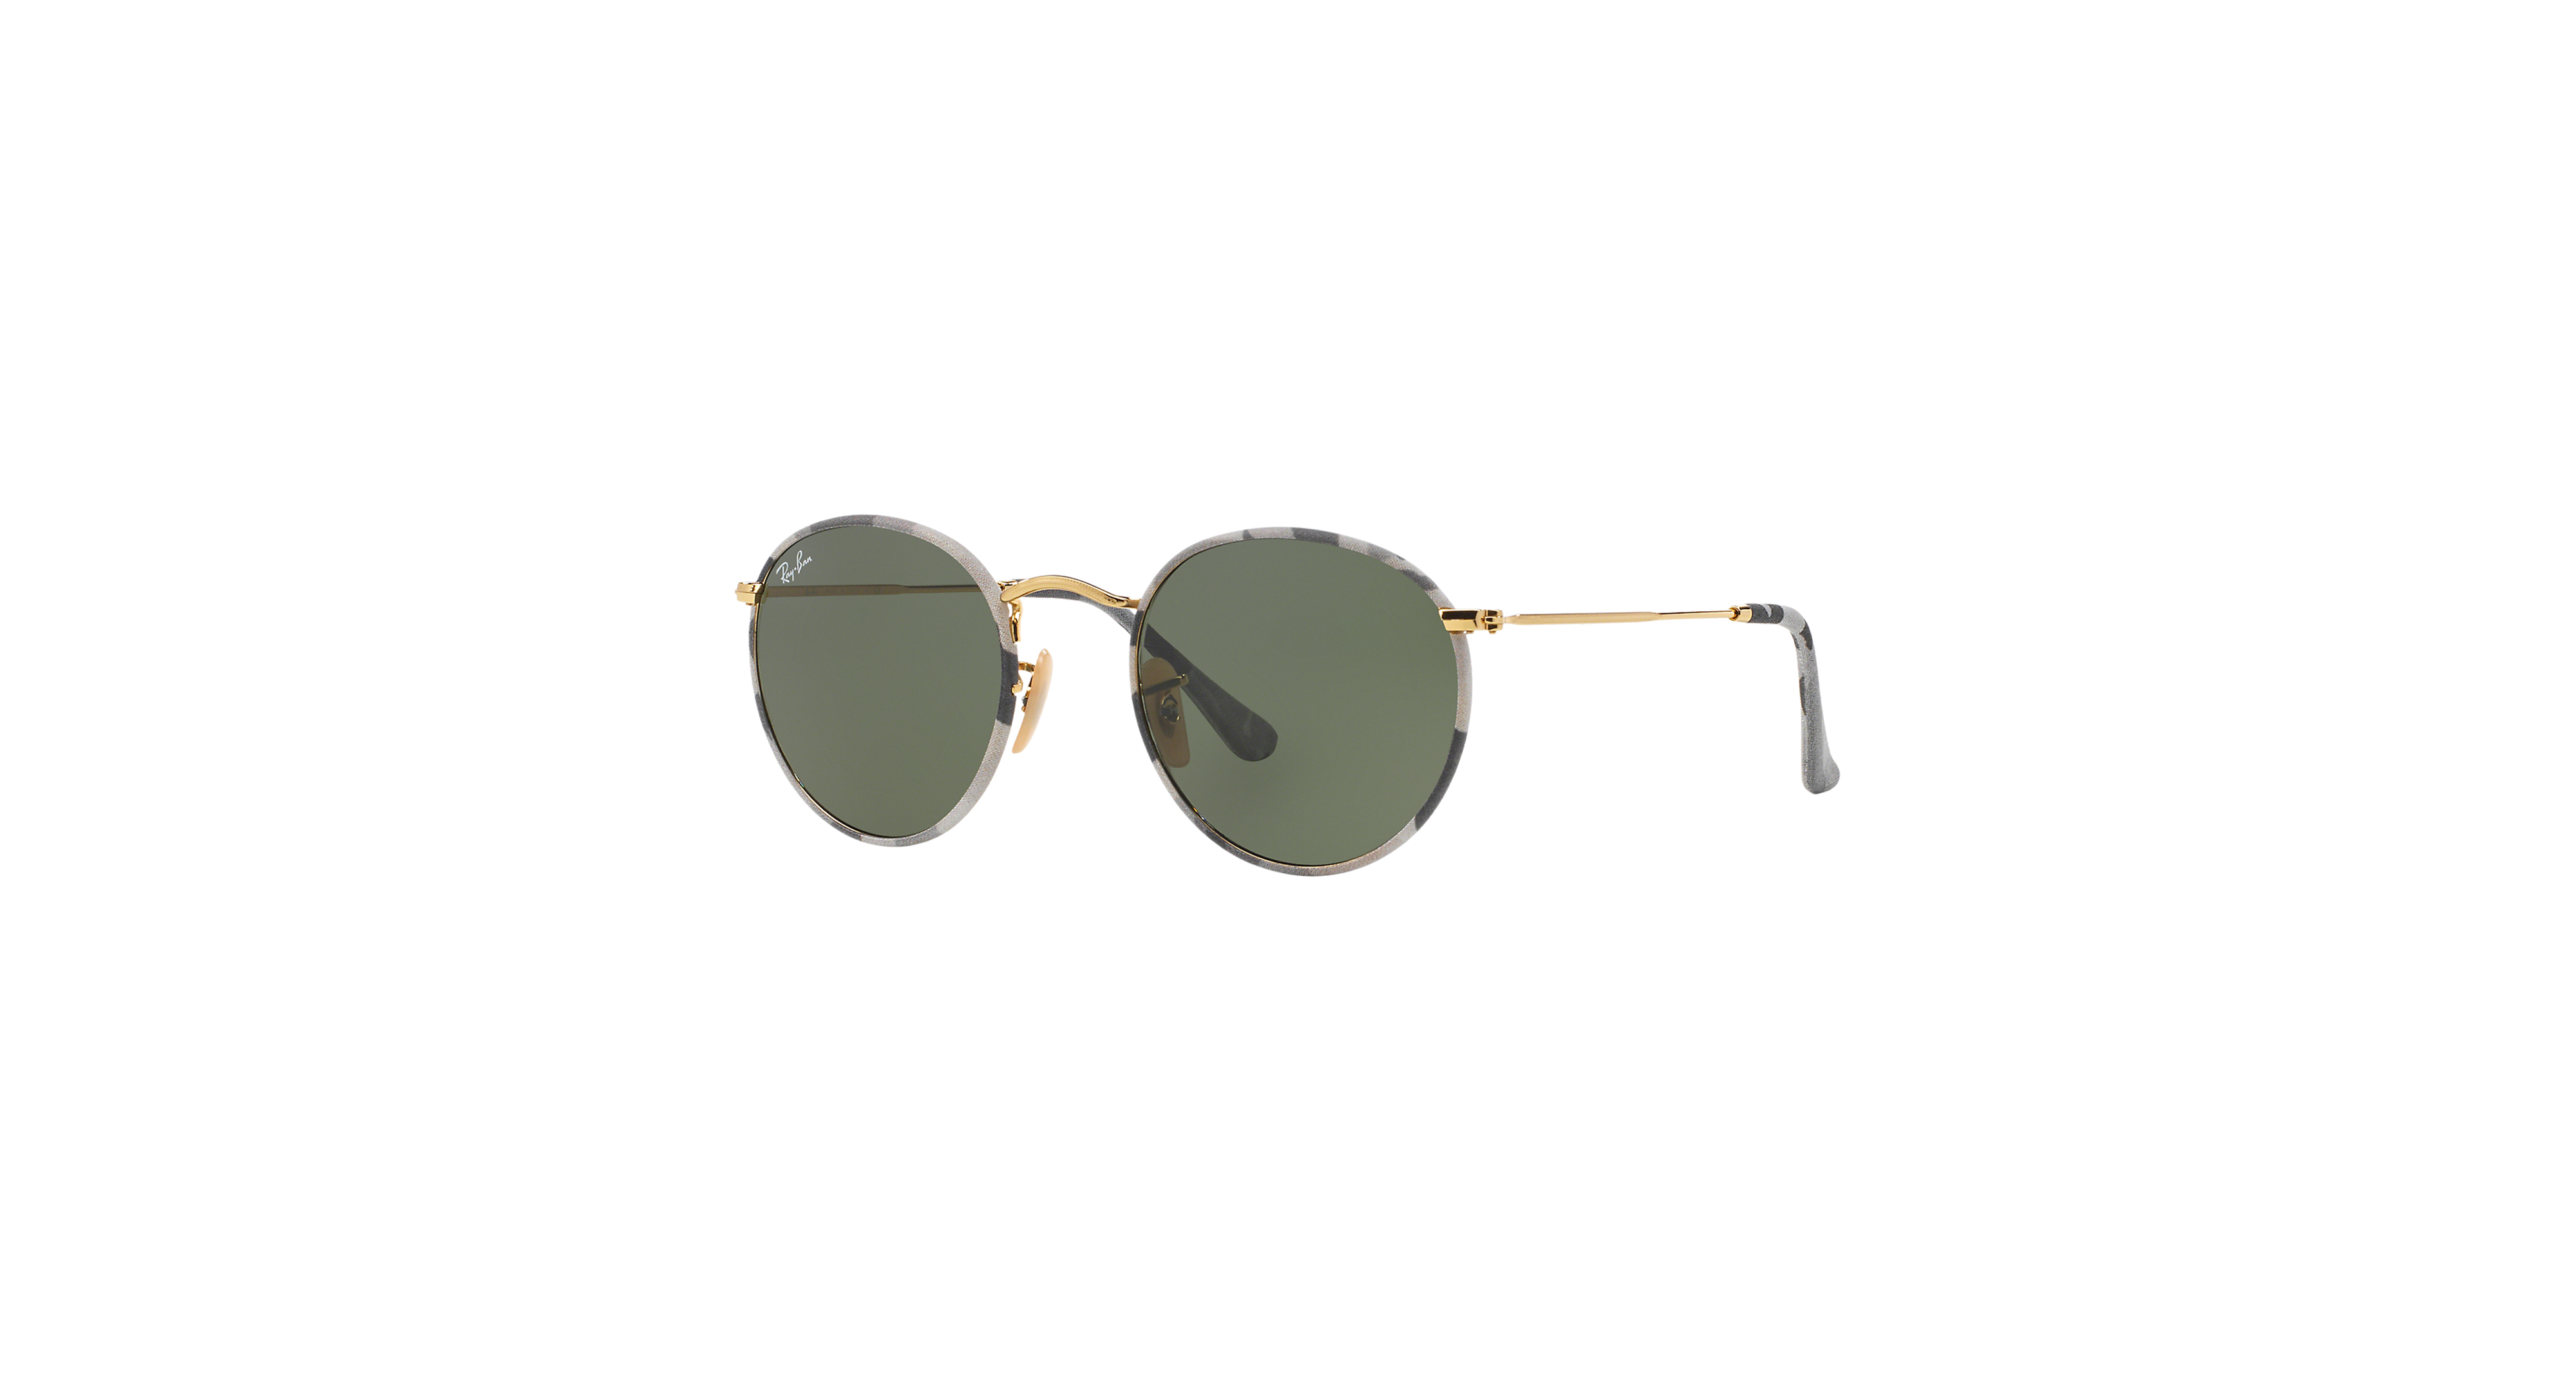 f09e0332d5 Ray-Ban Sunglasses